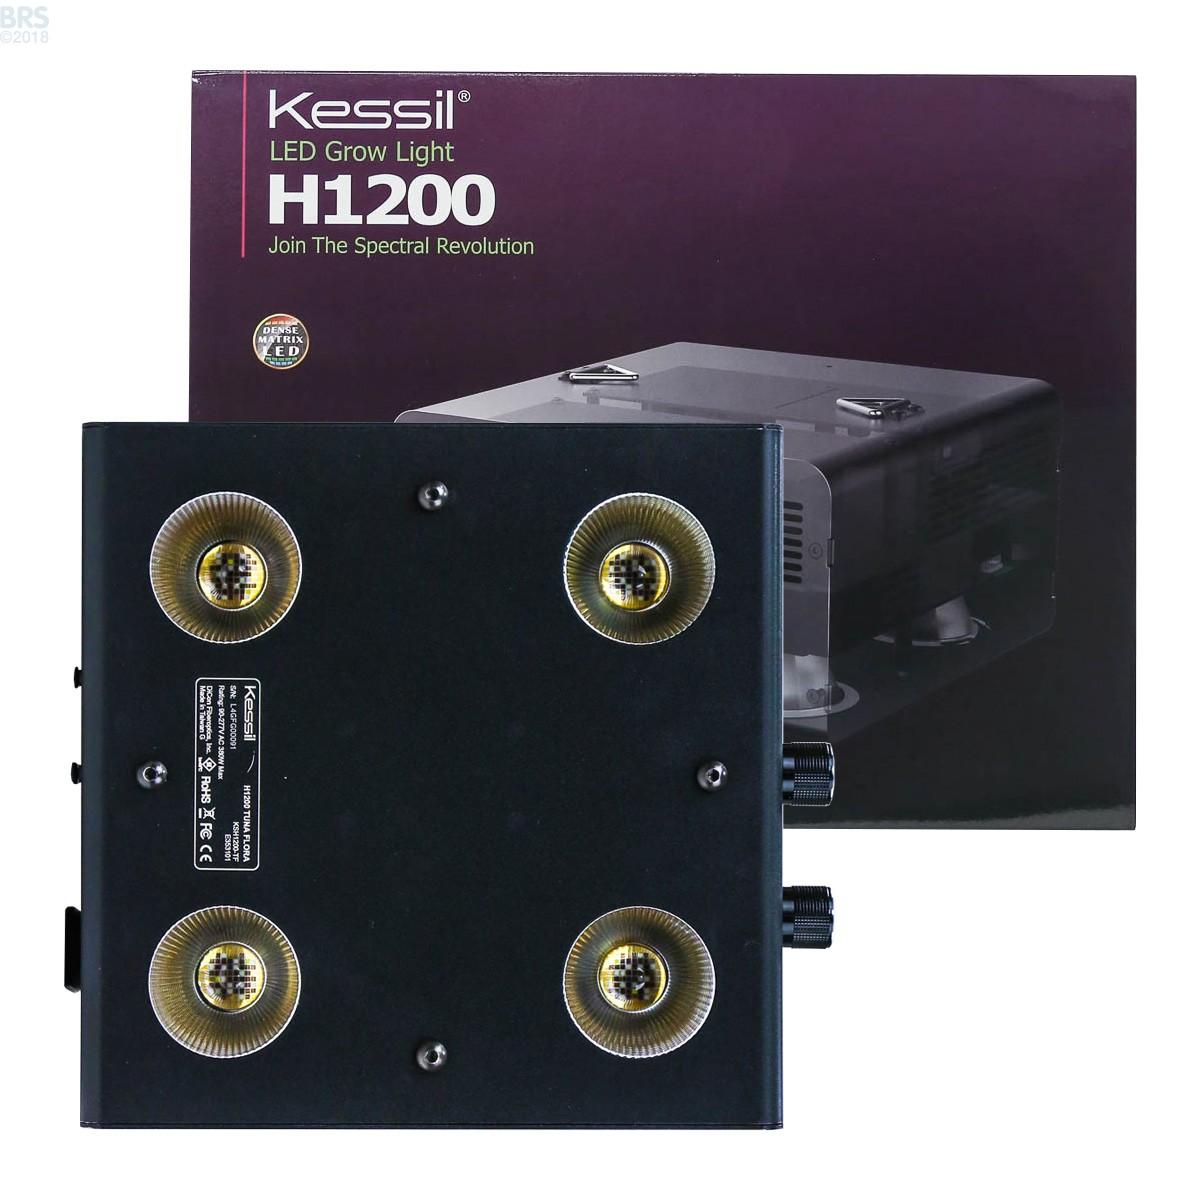 Kessil Led Grow Light 350 Review